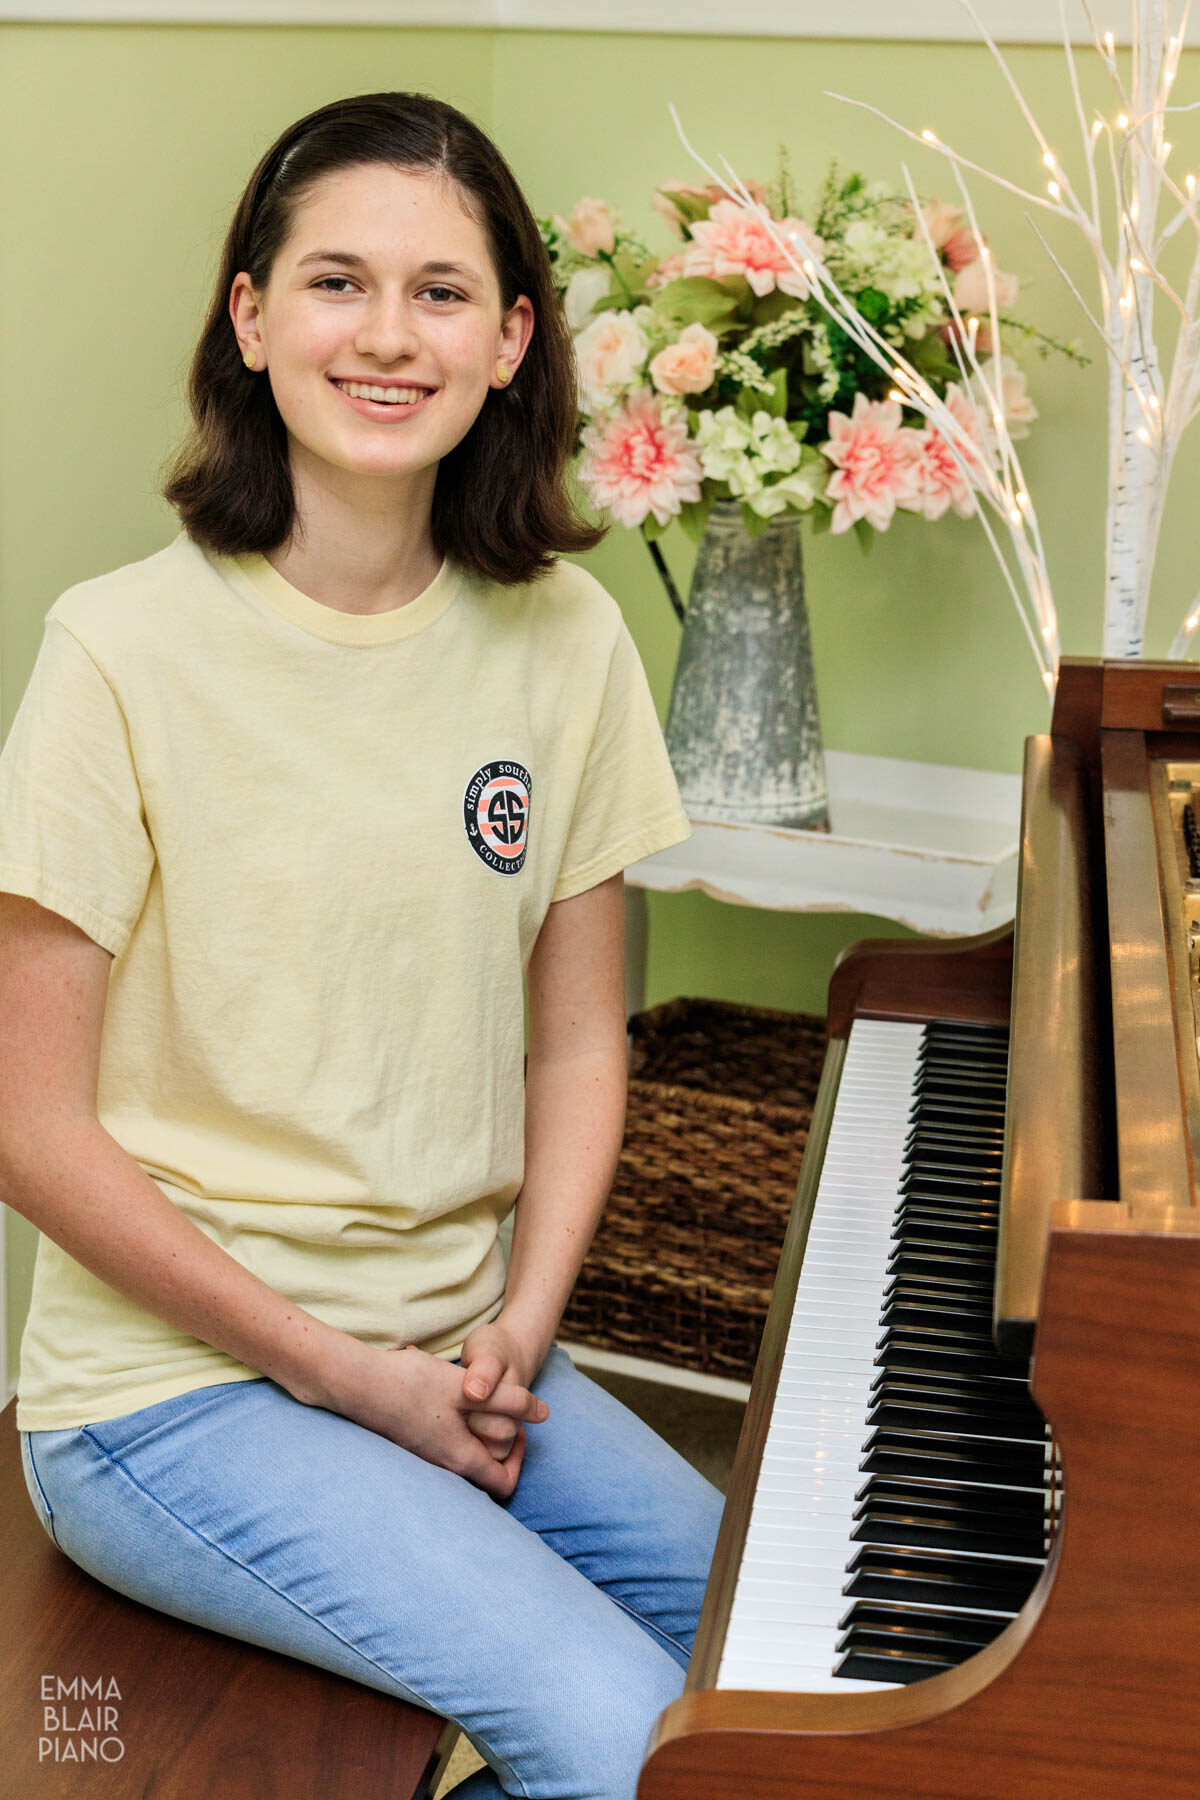 teenage girl sitting at a grand piano and smiling